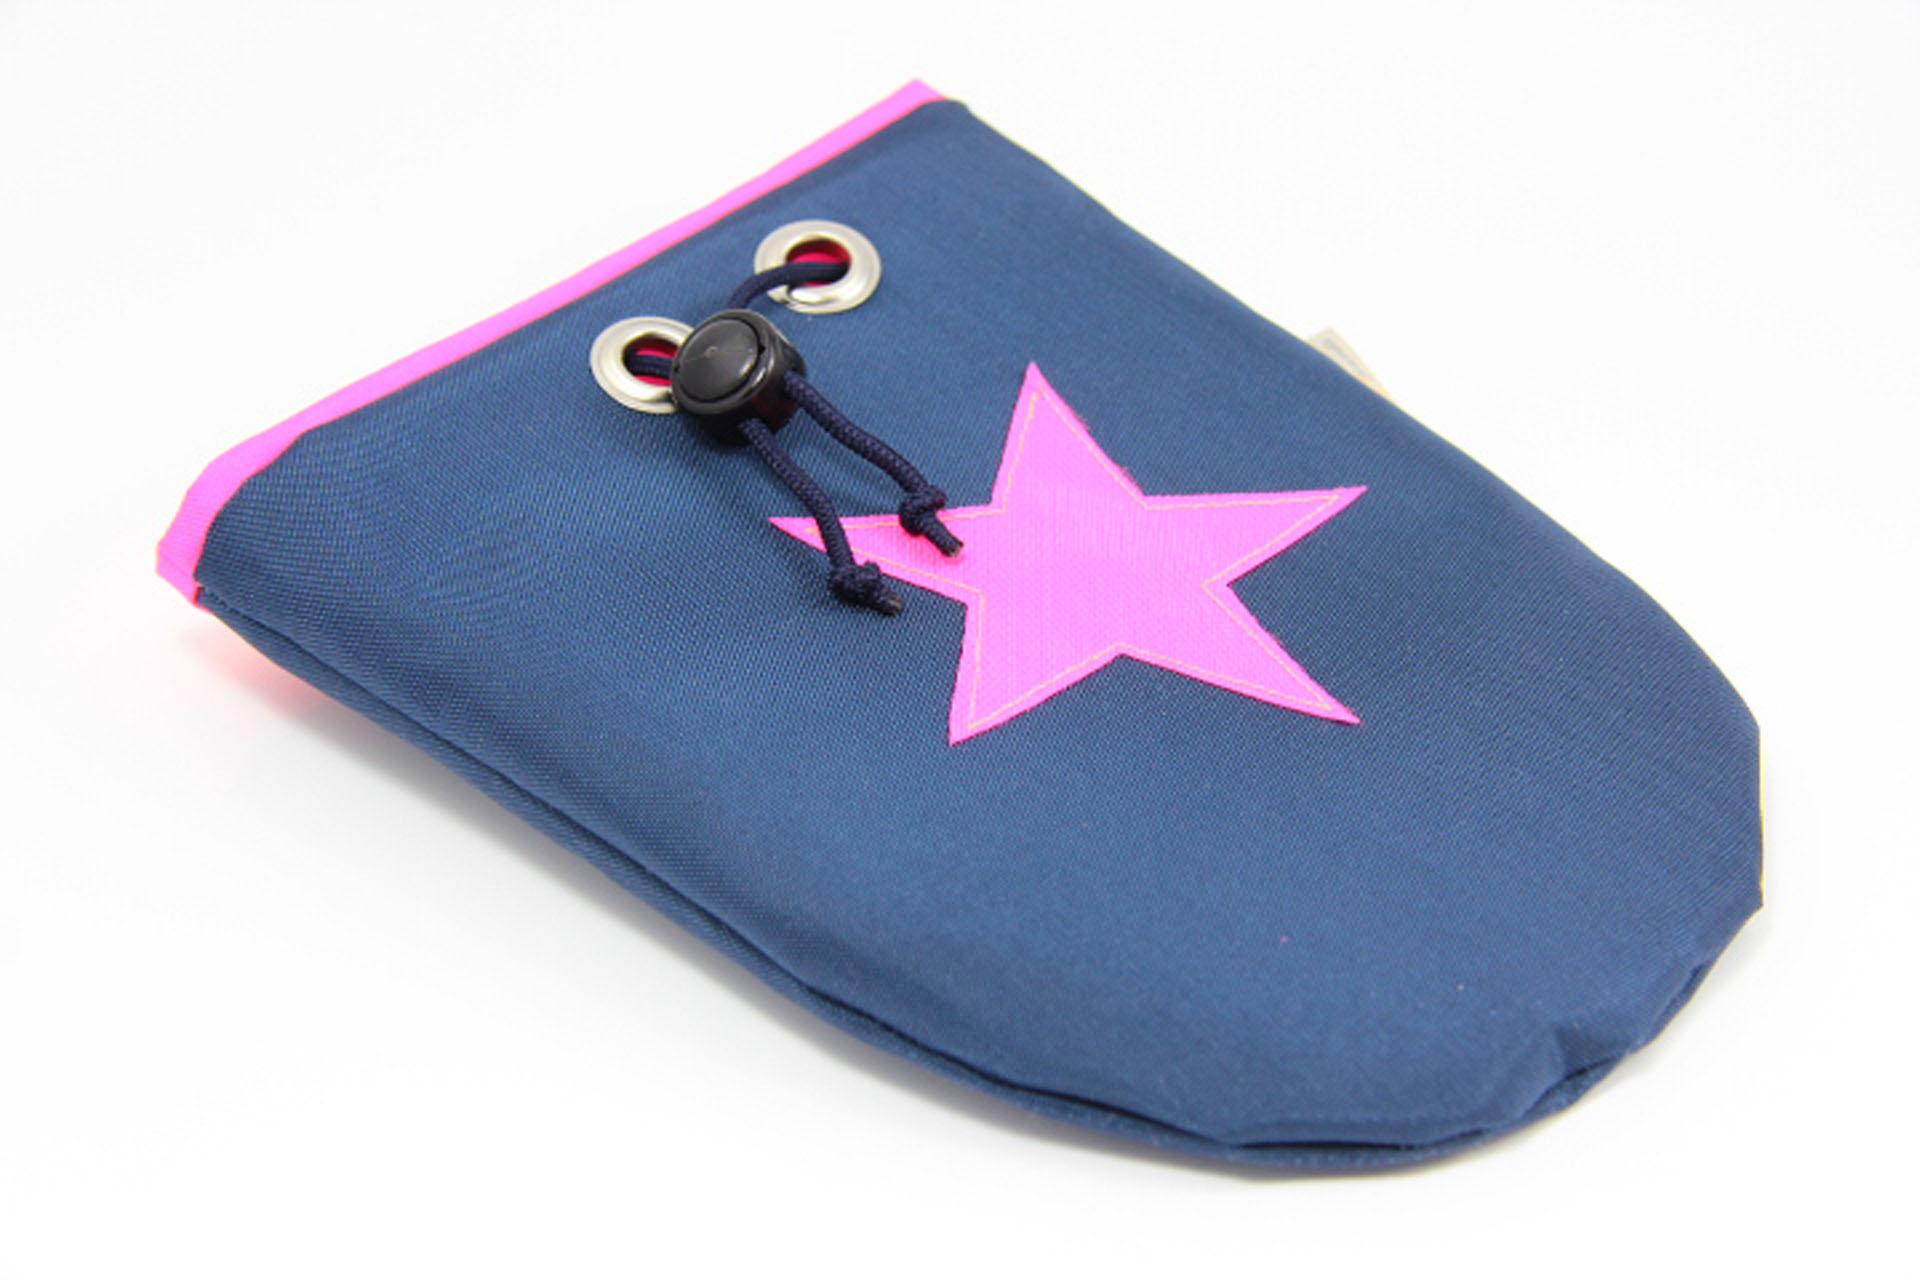 Leckerlibeutel-amy-and-friends-marineblau-neonpink